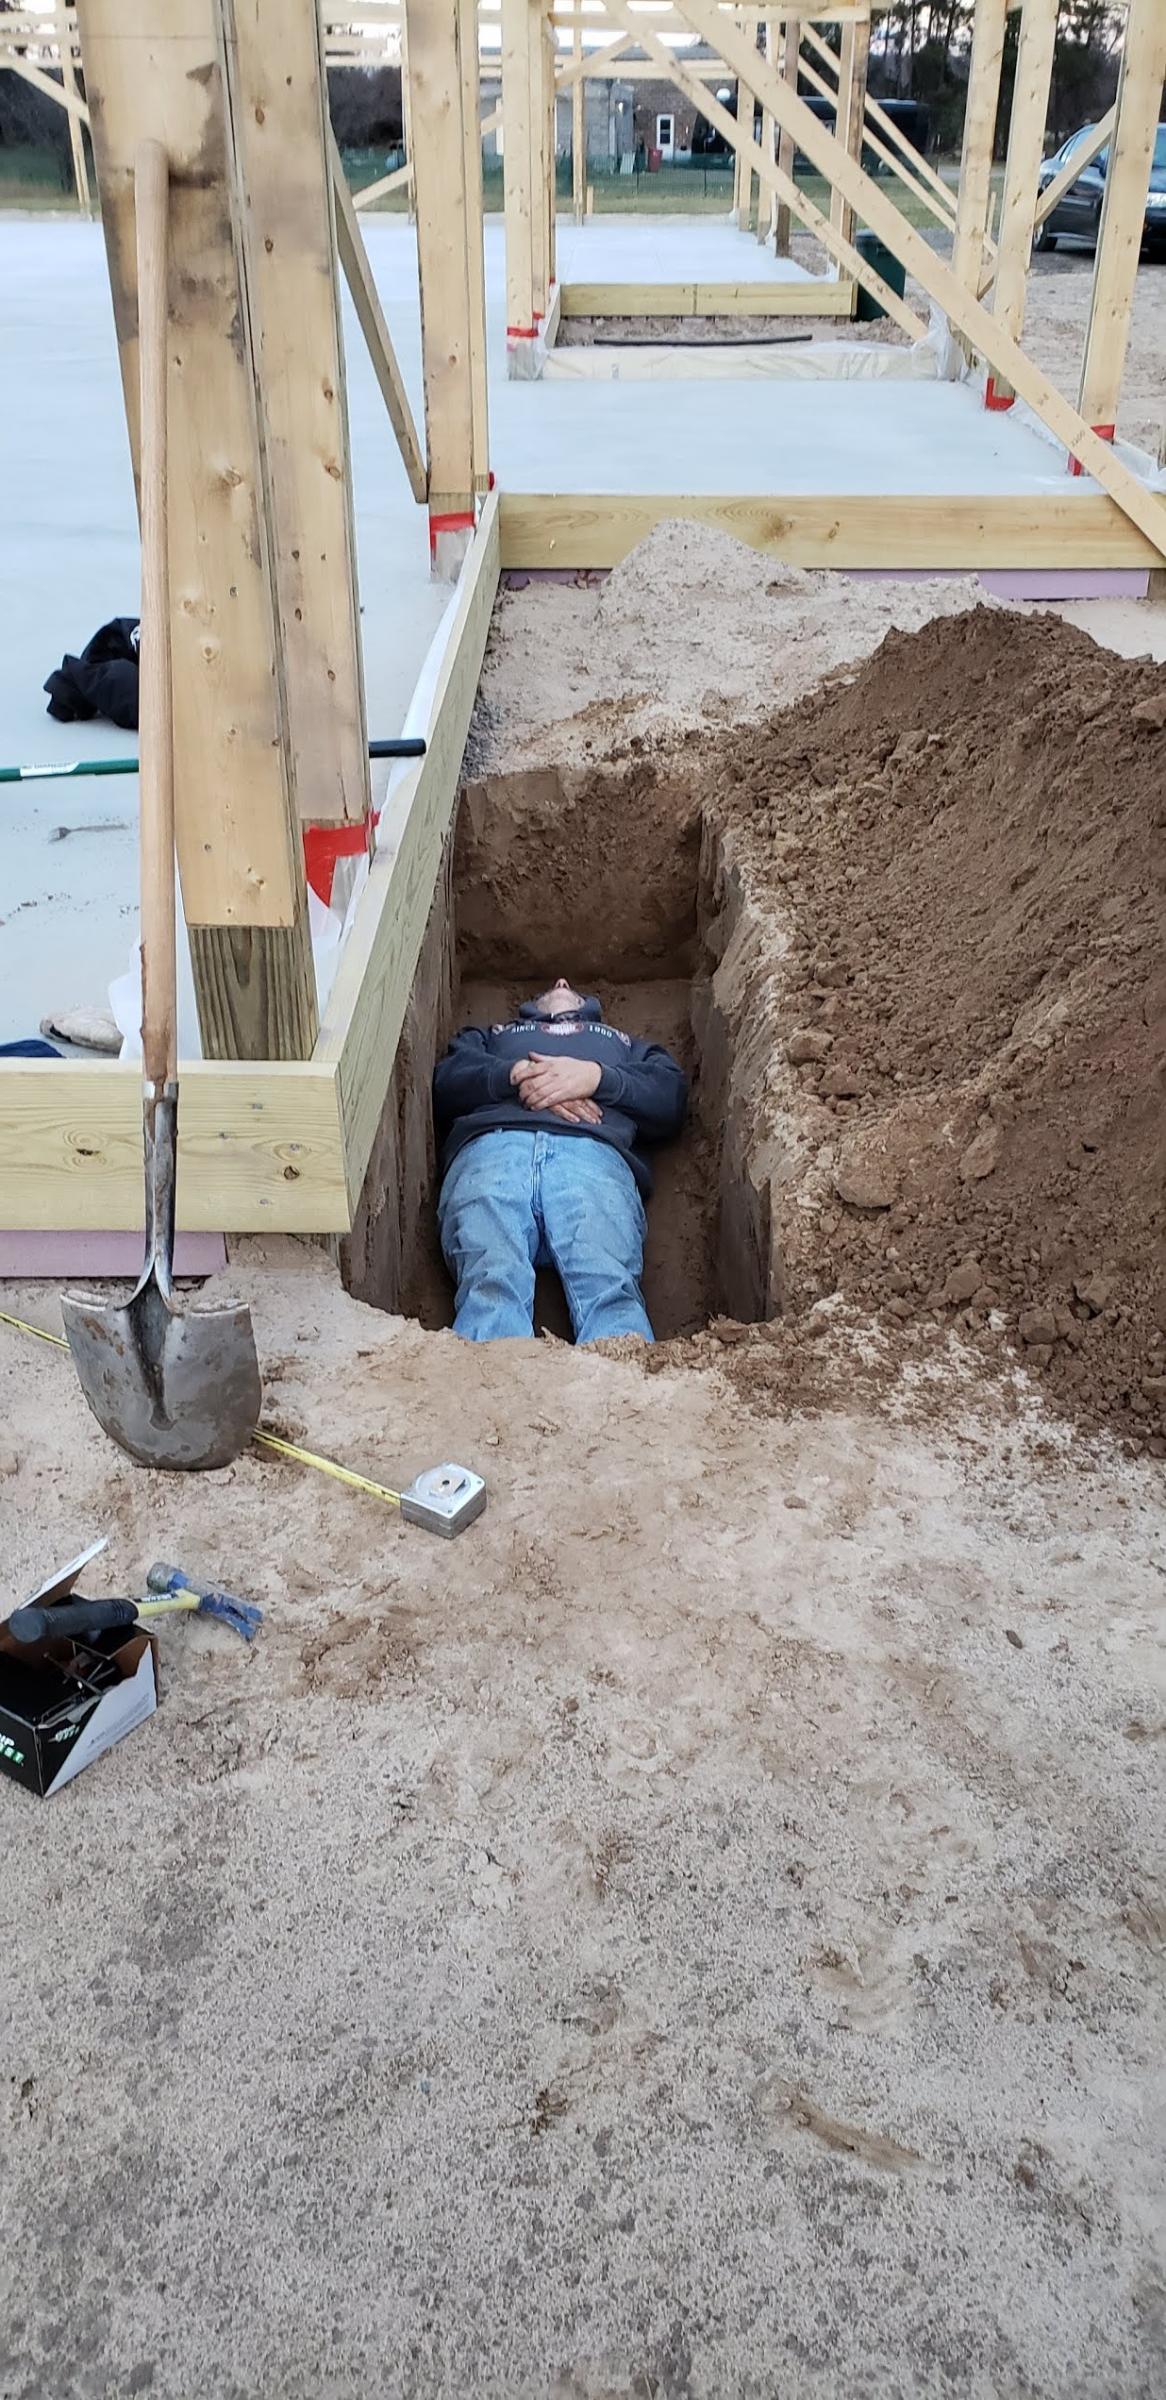 Our DIY home build. Margaskeeterville-download_20181102_184412_1541351802754.jpg